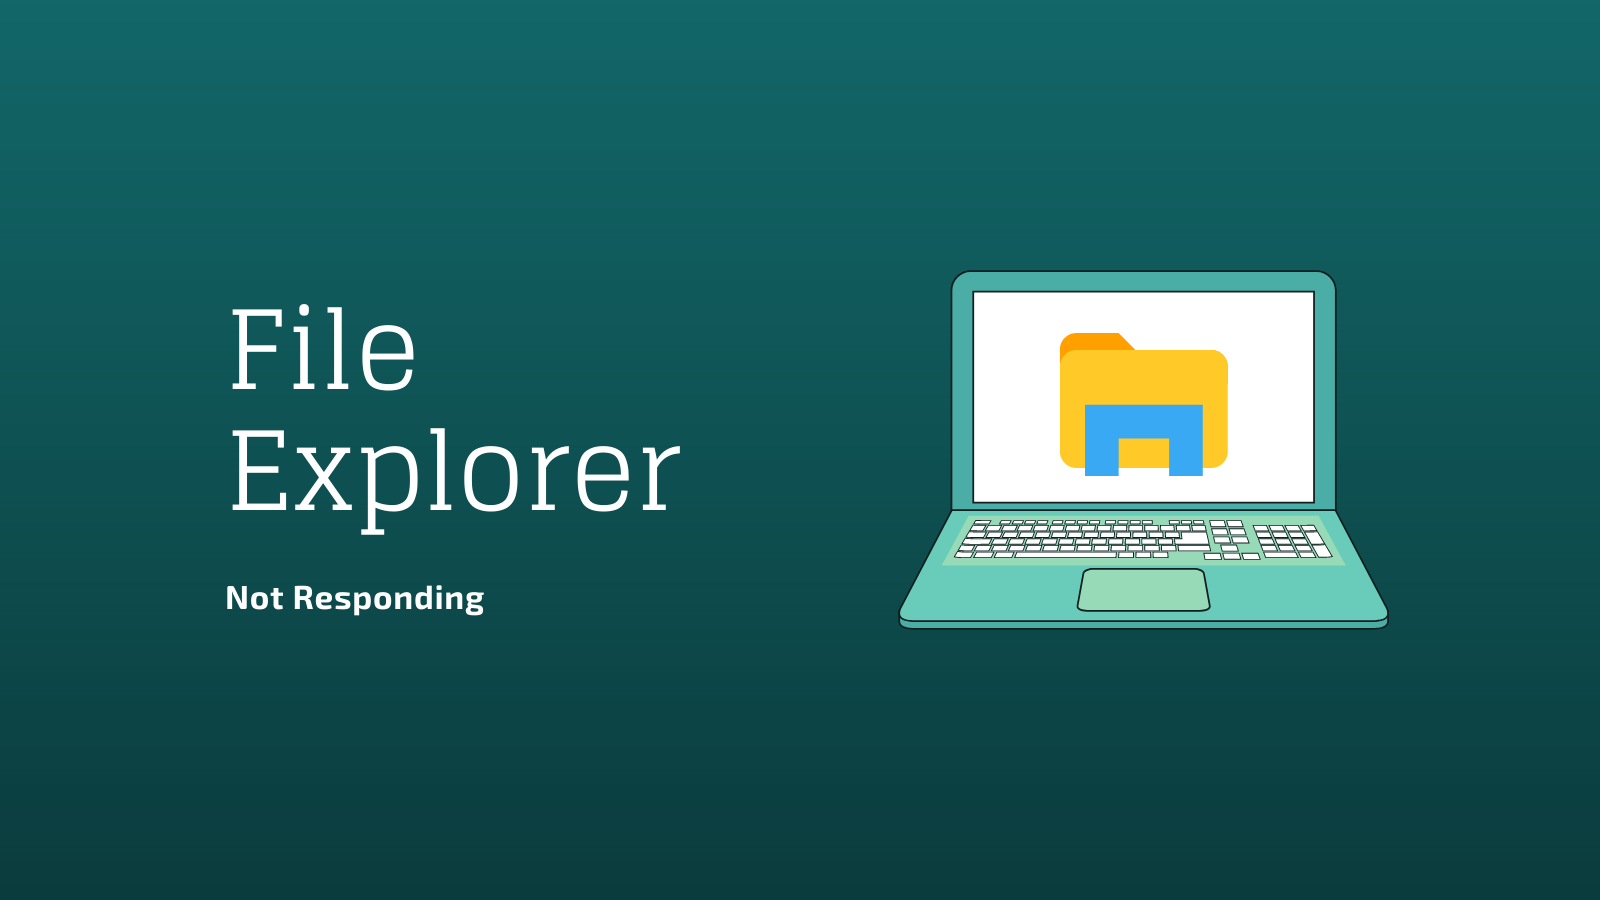 How to Fix File Explorer Not Responding On Windows 10?